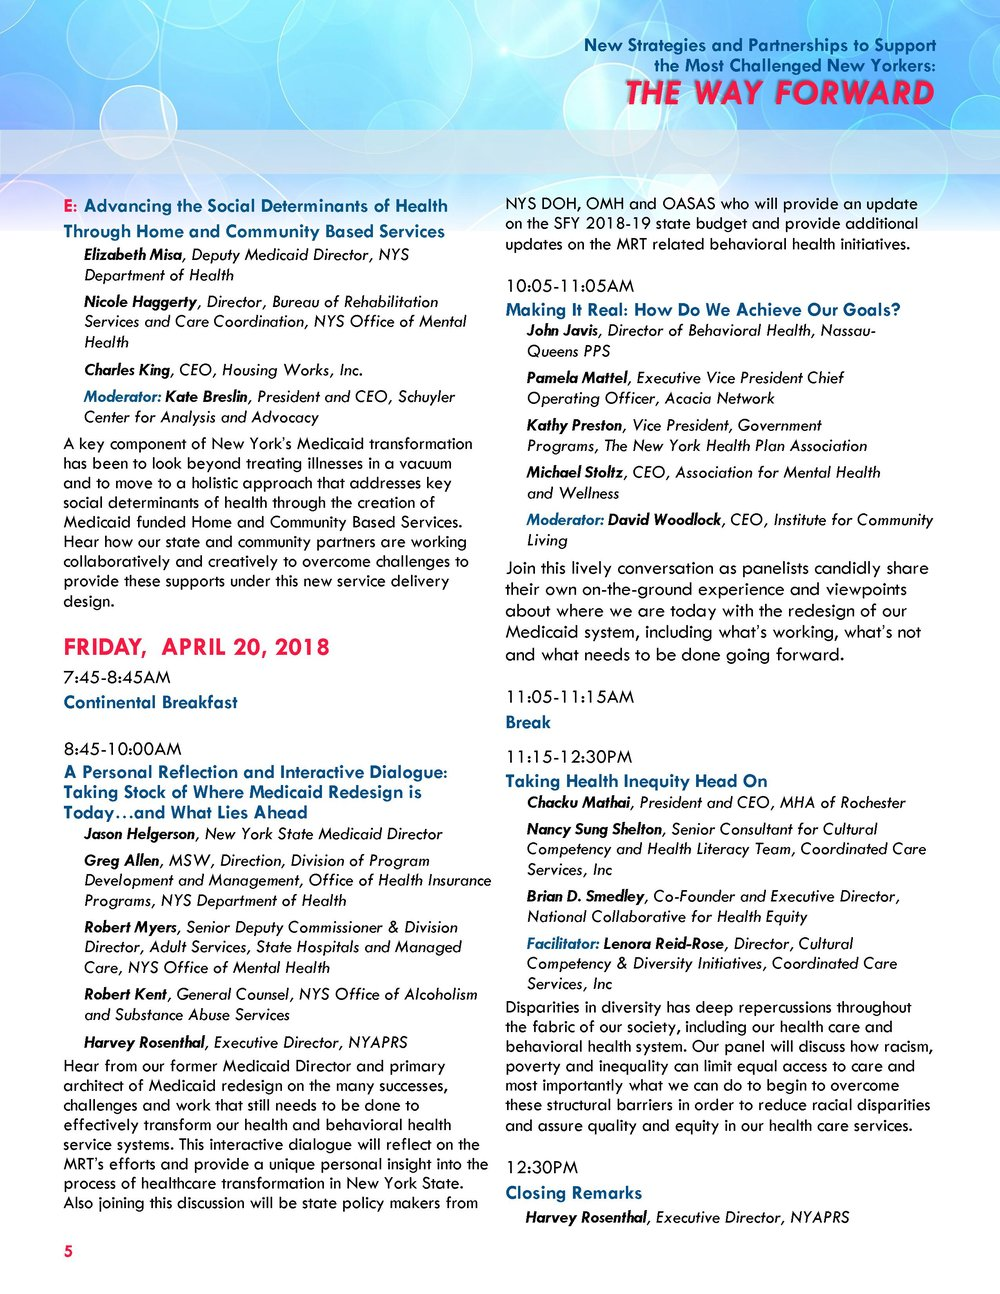 NYAPRS 2018 Executive Seminar Program-5.jpg